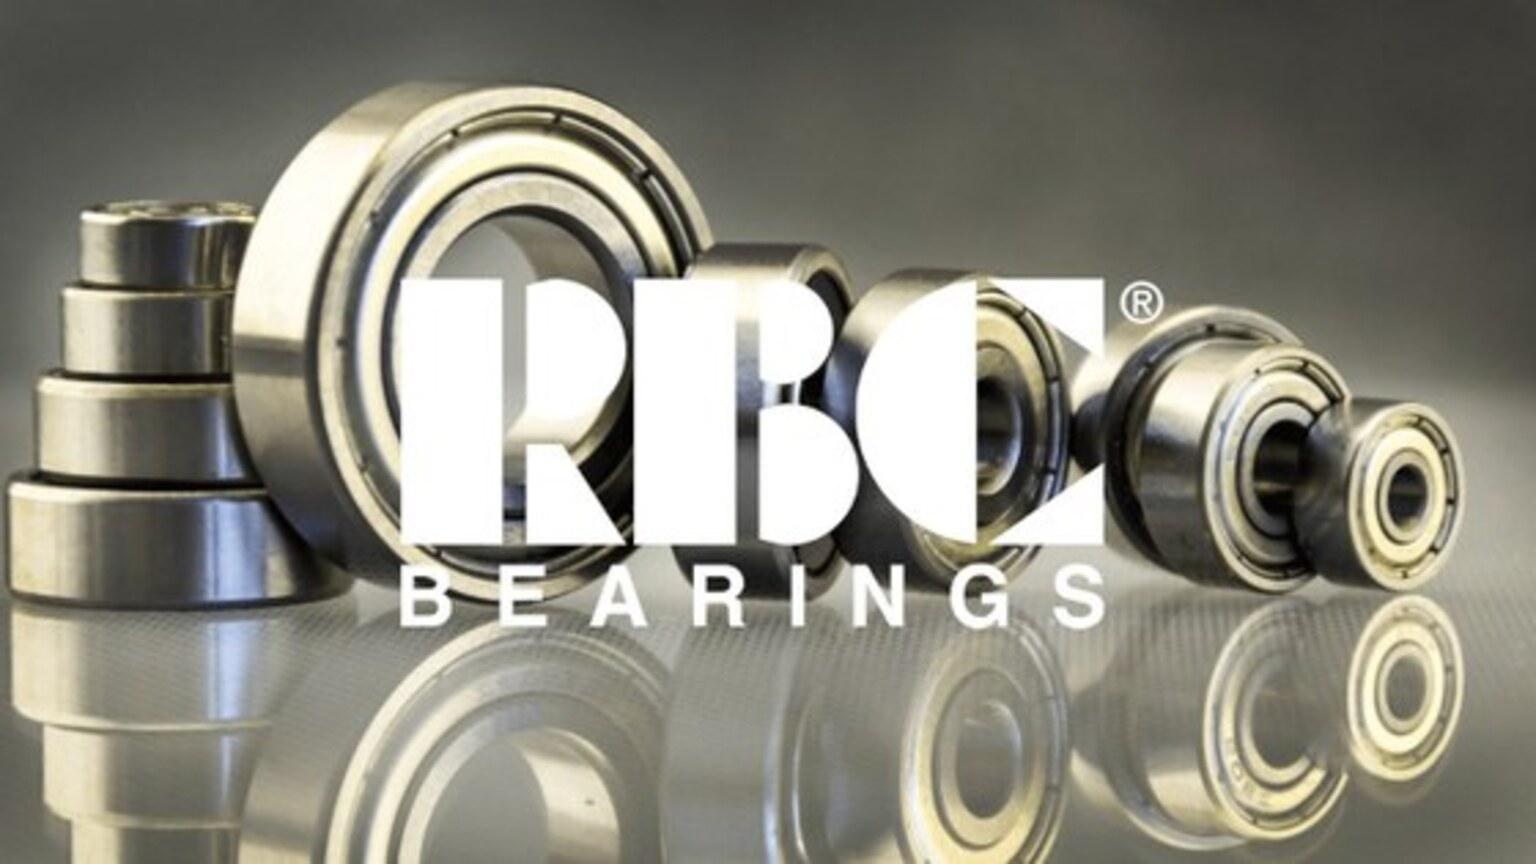 rbc-bearings-transforms-financial-close